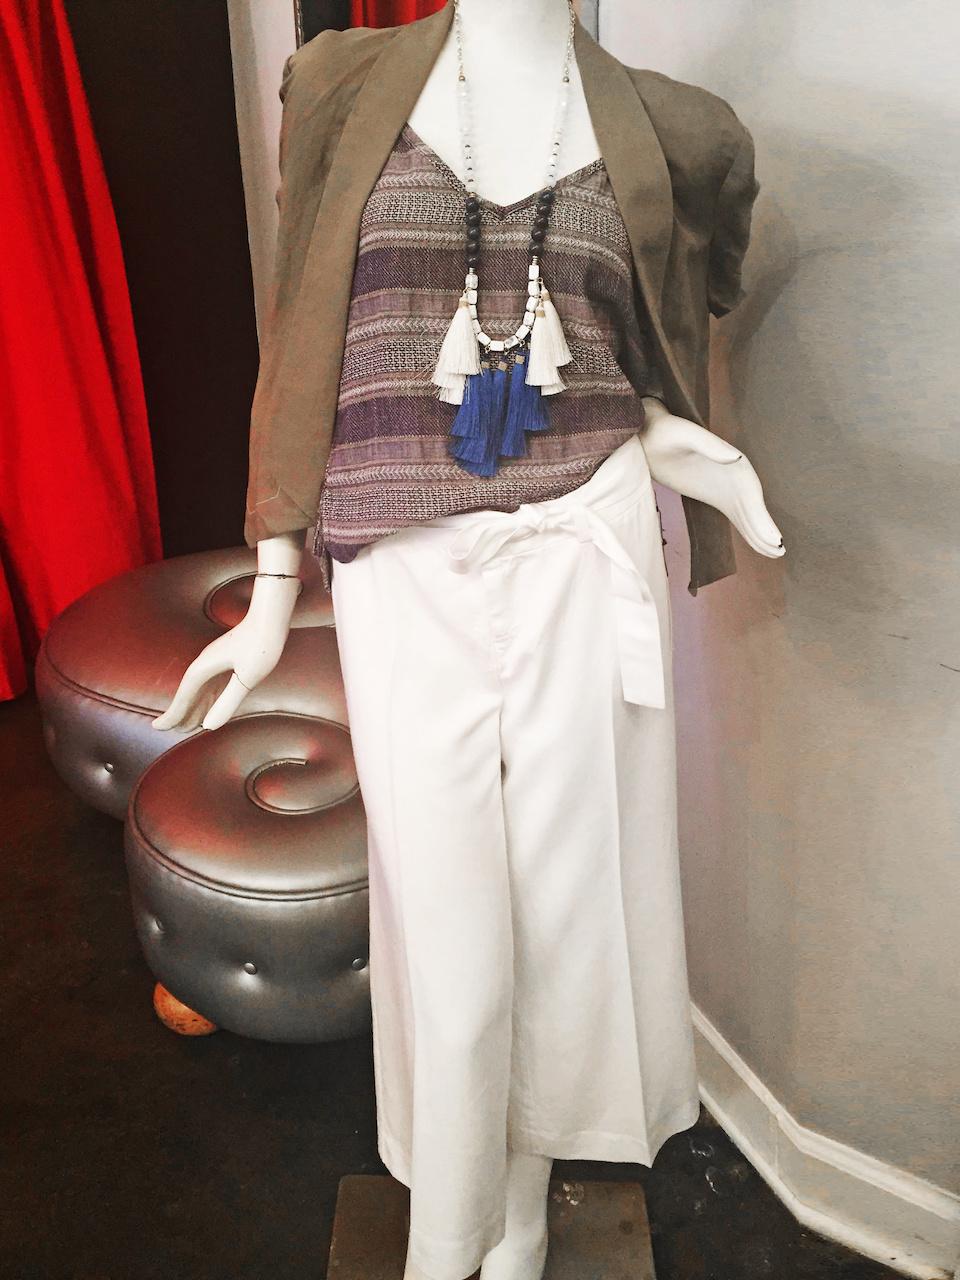 From Theadora Abbeyluxe: Lilla P jacket, $172; Sloane Rouge indigo tank, $89; Ecru white wide-leg cropped pant, $180